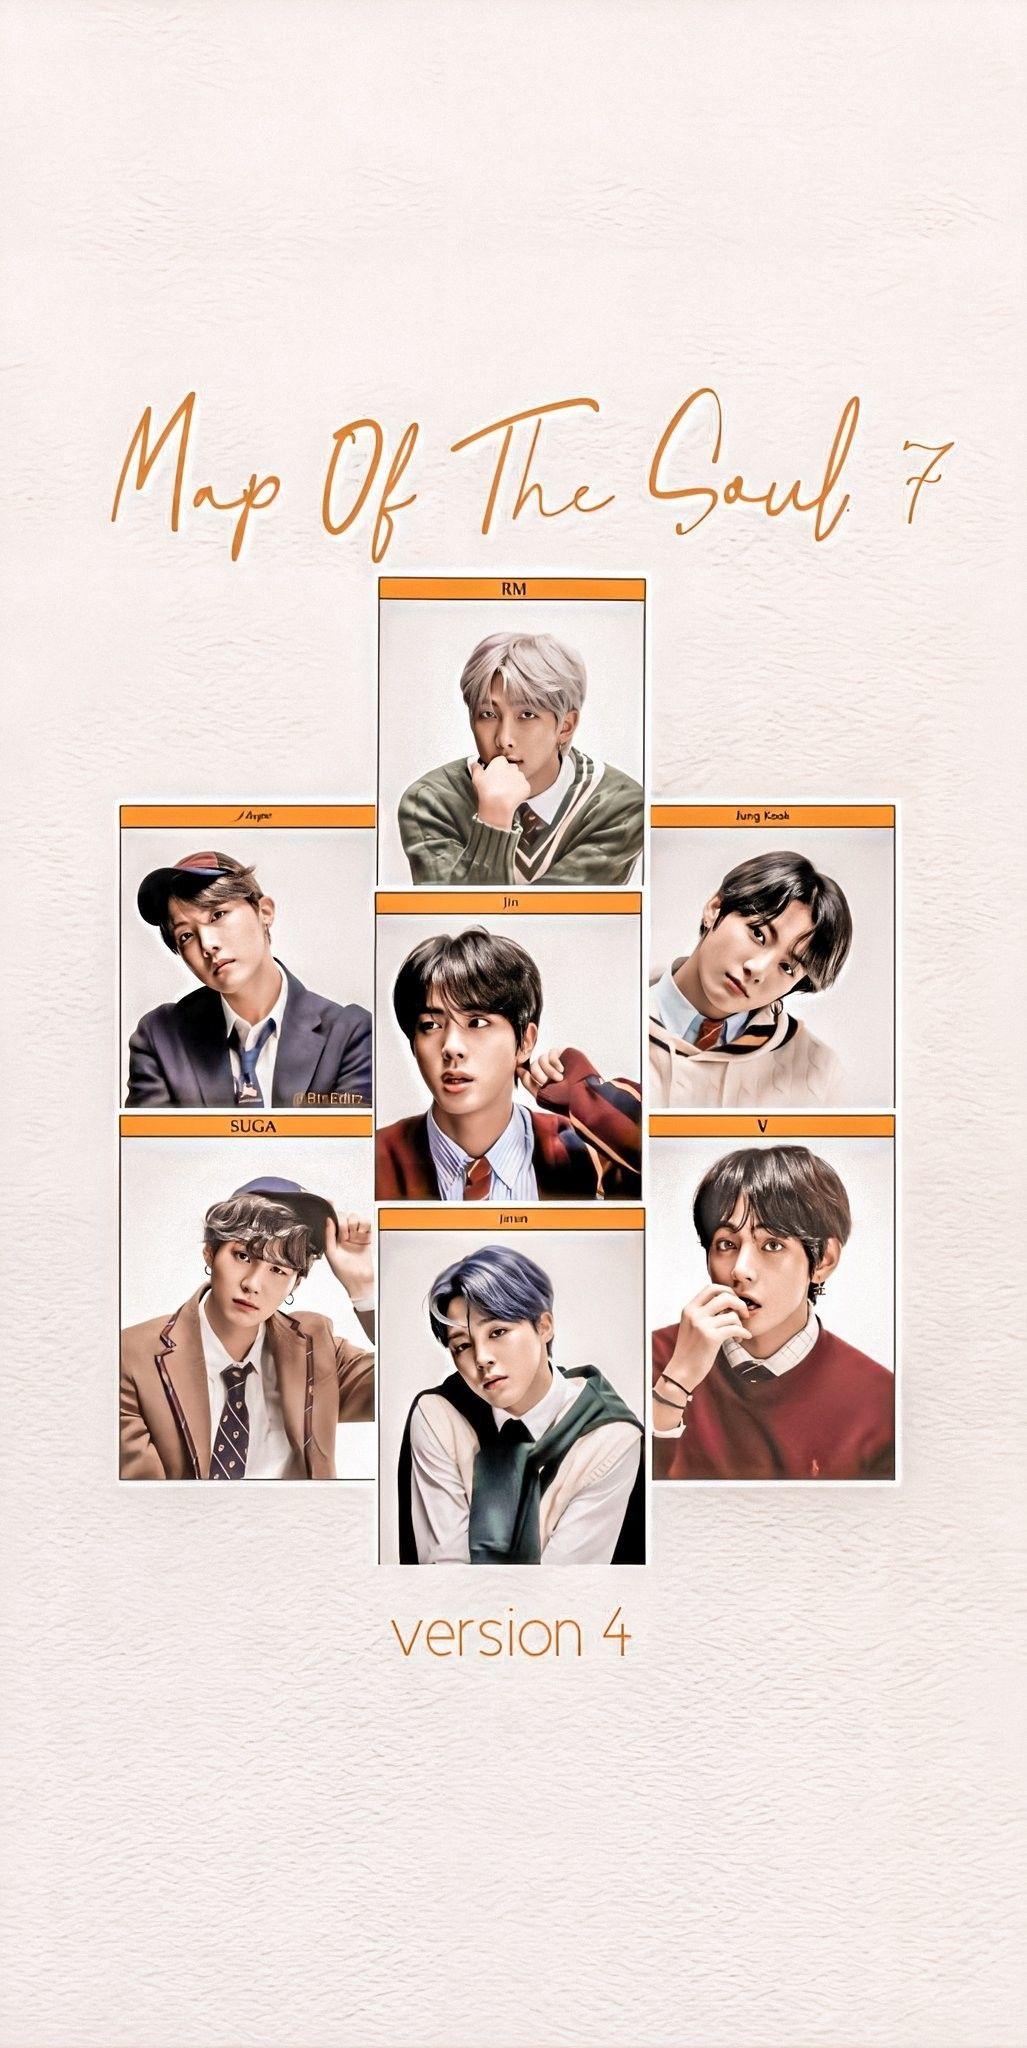 #BTS #방탄소년단 #MAP_OF_THE_SOUL_7 Concept Photo version 4 Wallpapers - BTS WallpapersLockscreen...